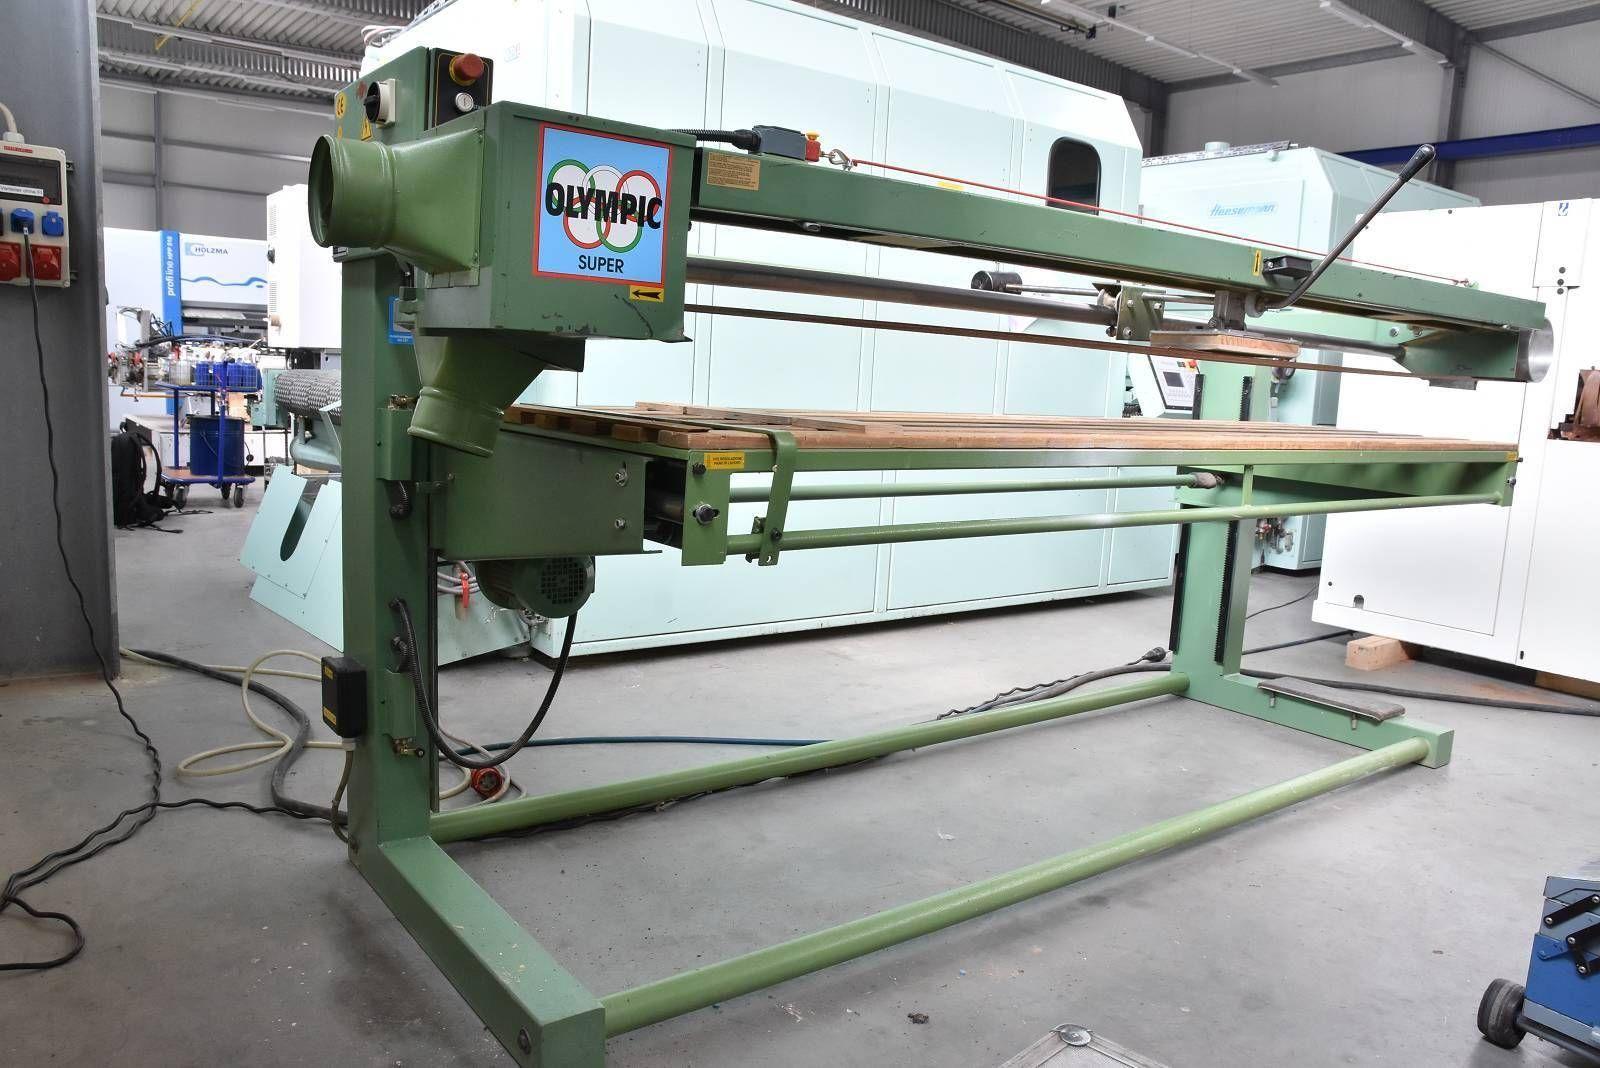 Langbandschleifmaschine MABO OLYMPIC SUPER